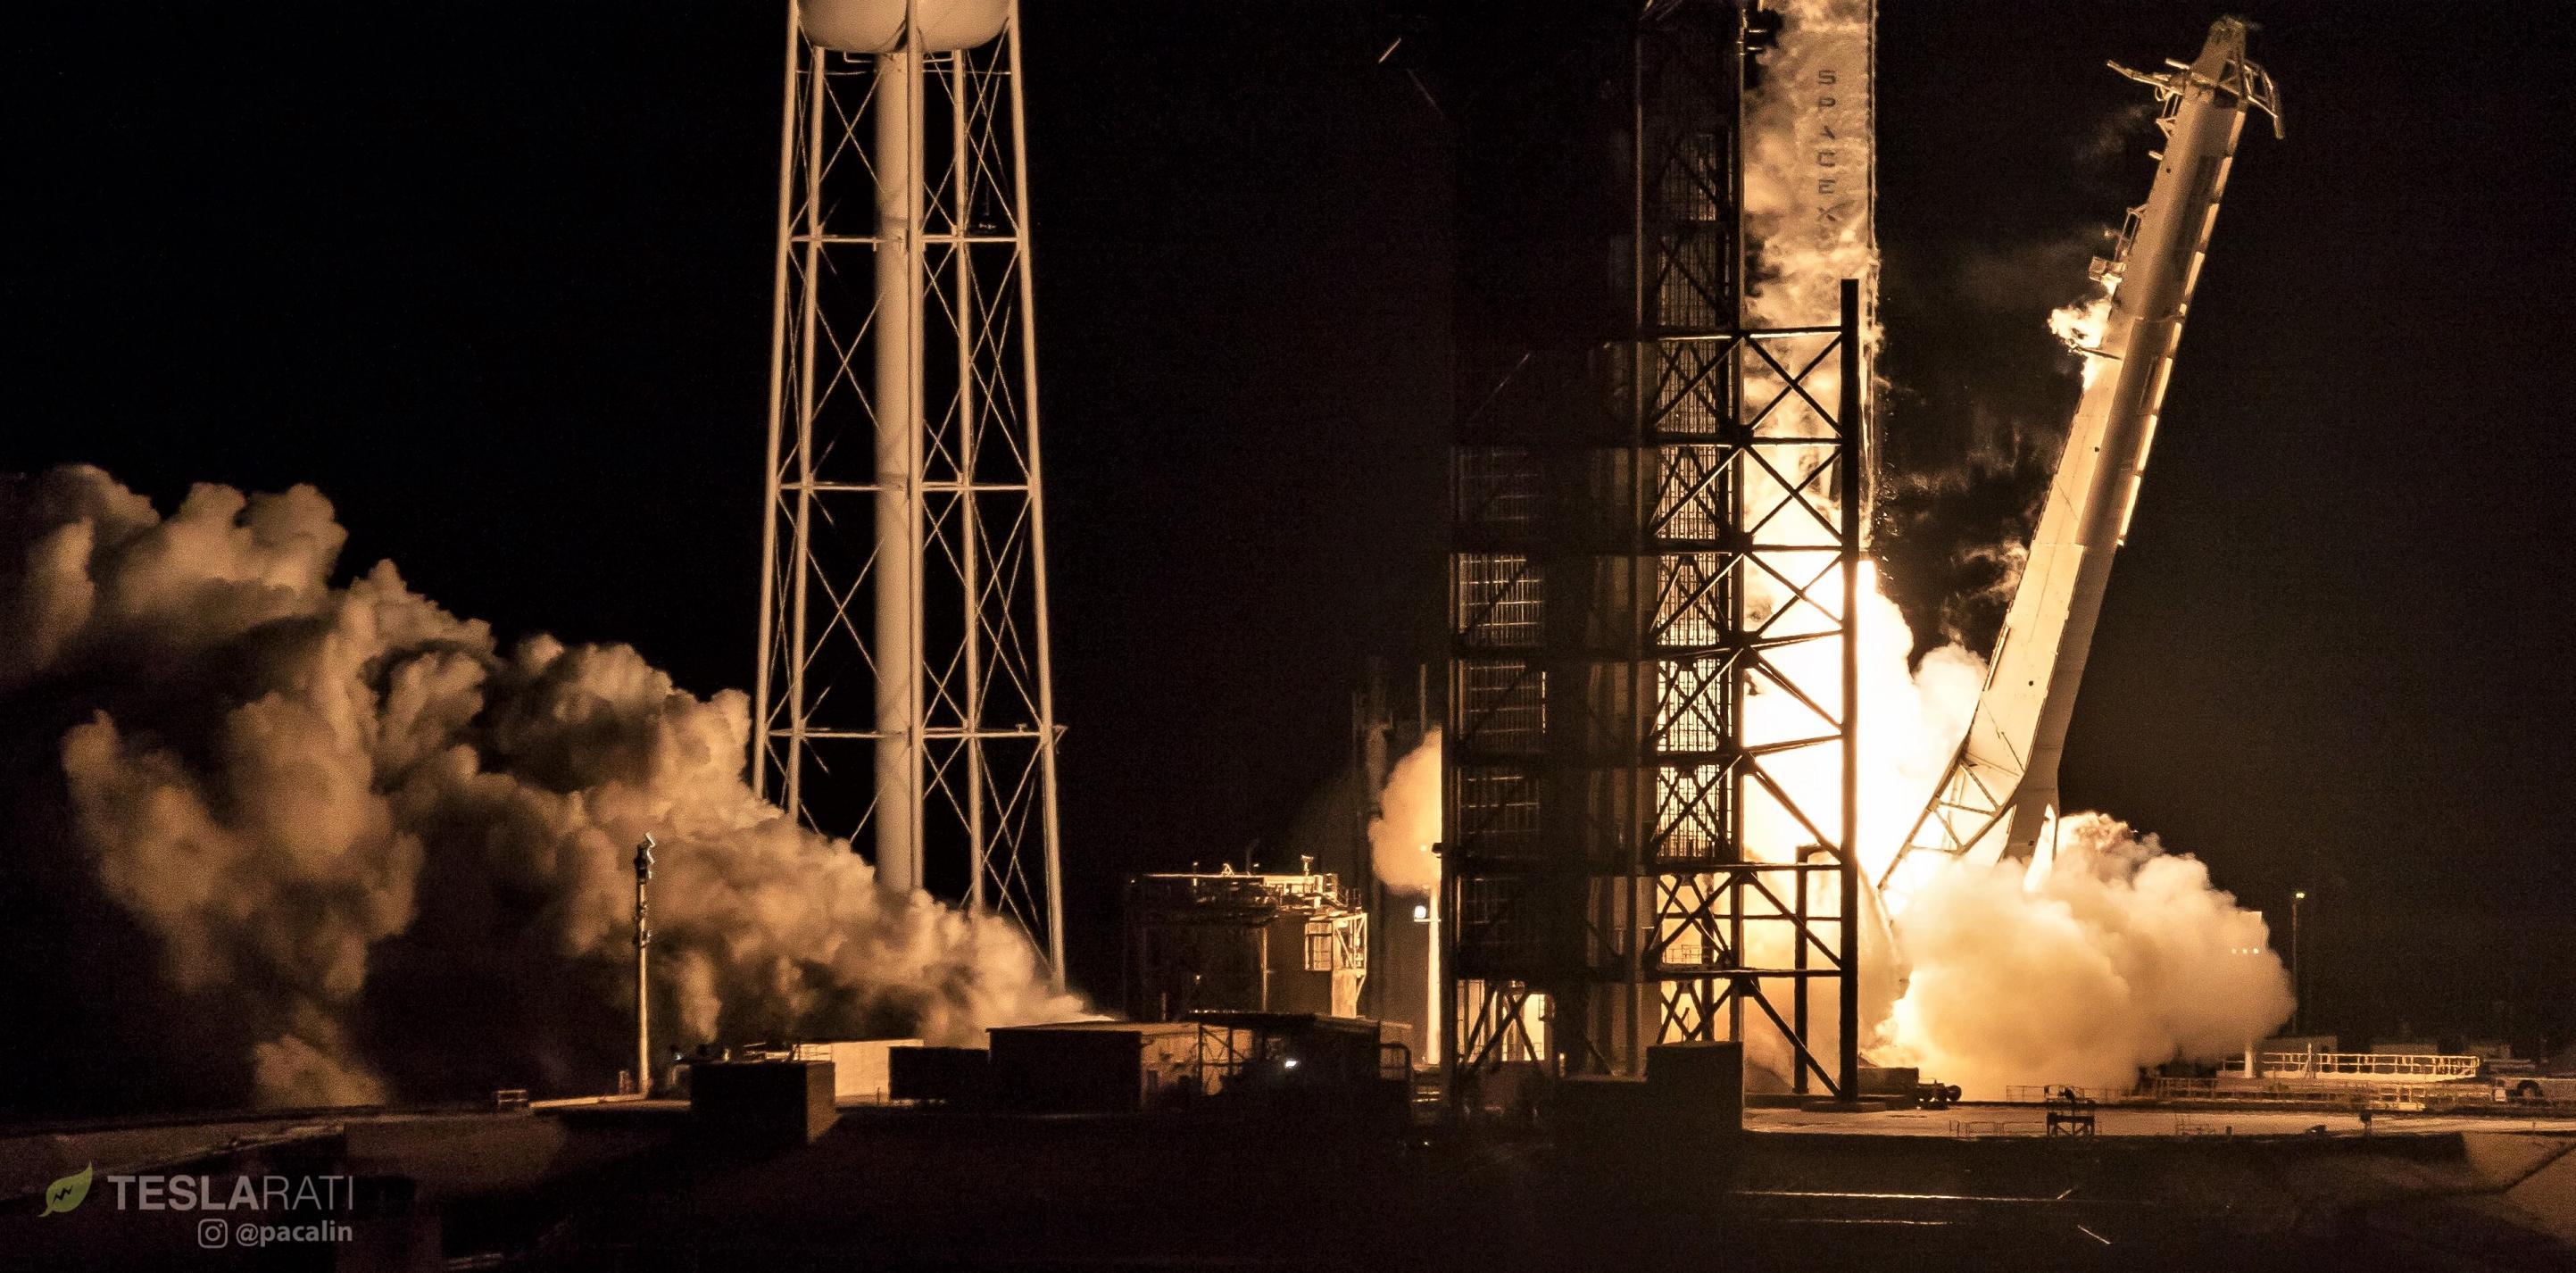 Crew Dragon Falcon 9 B1051 DM-1 liftoff 030219 (Pauline Acalin) 1 crop (c)